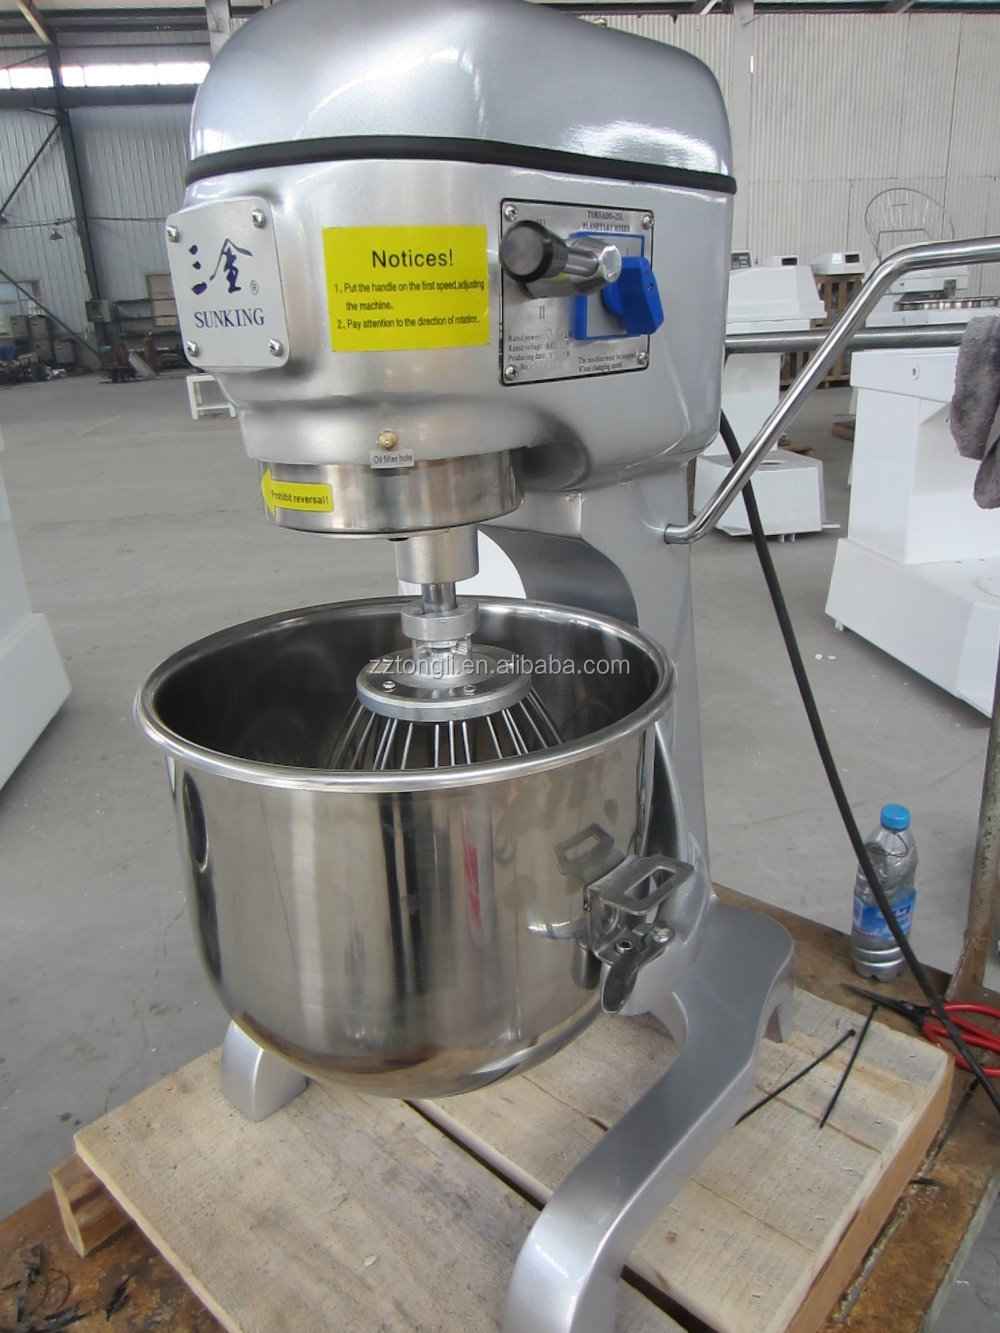 hot selling milk hobart planetary mixers cake mixing machine industrial food mixer buy food. Black Bedroom Furniture Sets. Home Design Ideas